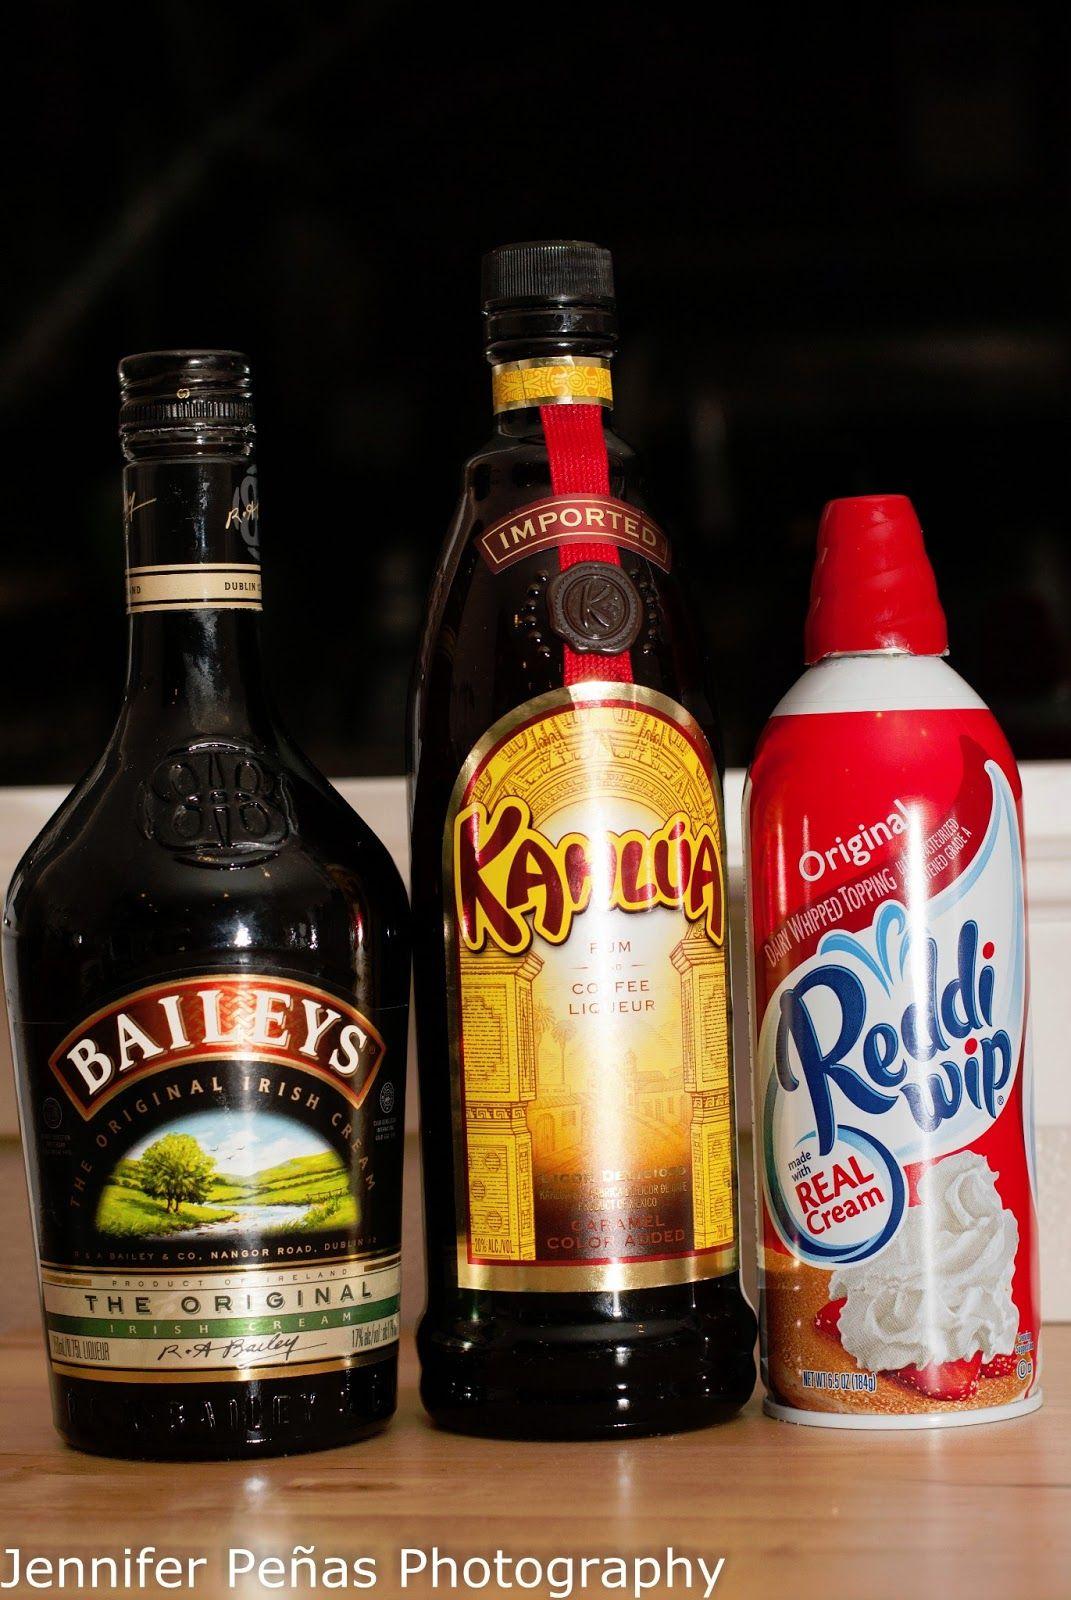 3/4 oz Kahlua first then 3/4 oz Baileys Irish Cream top with whip ...